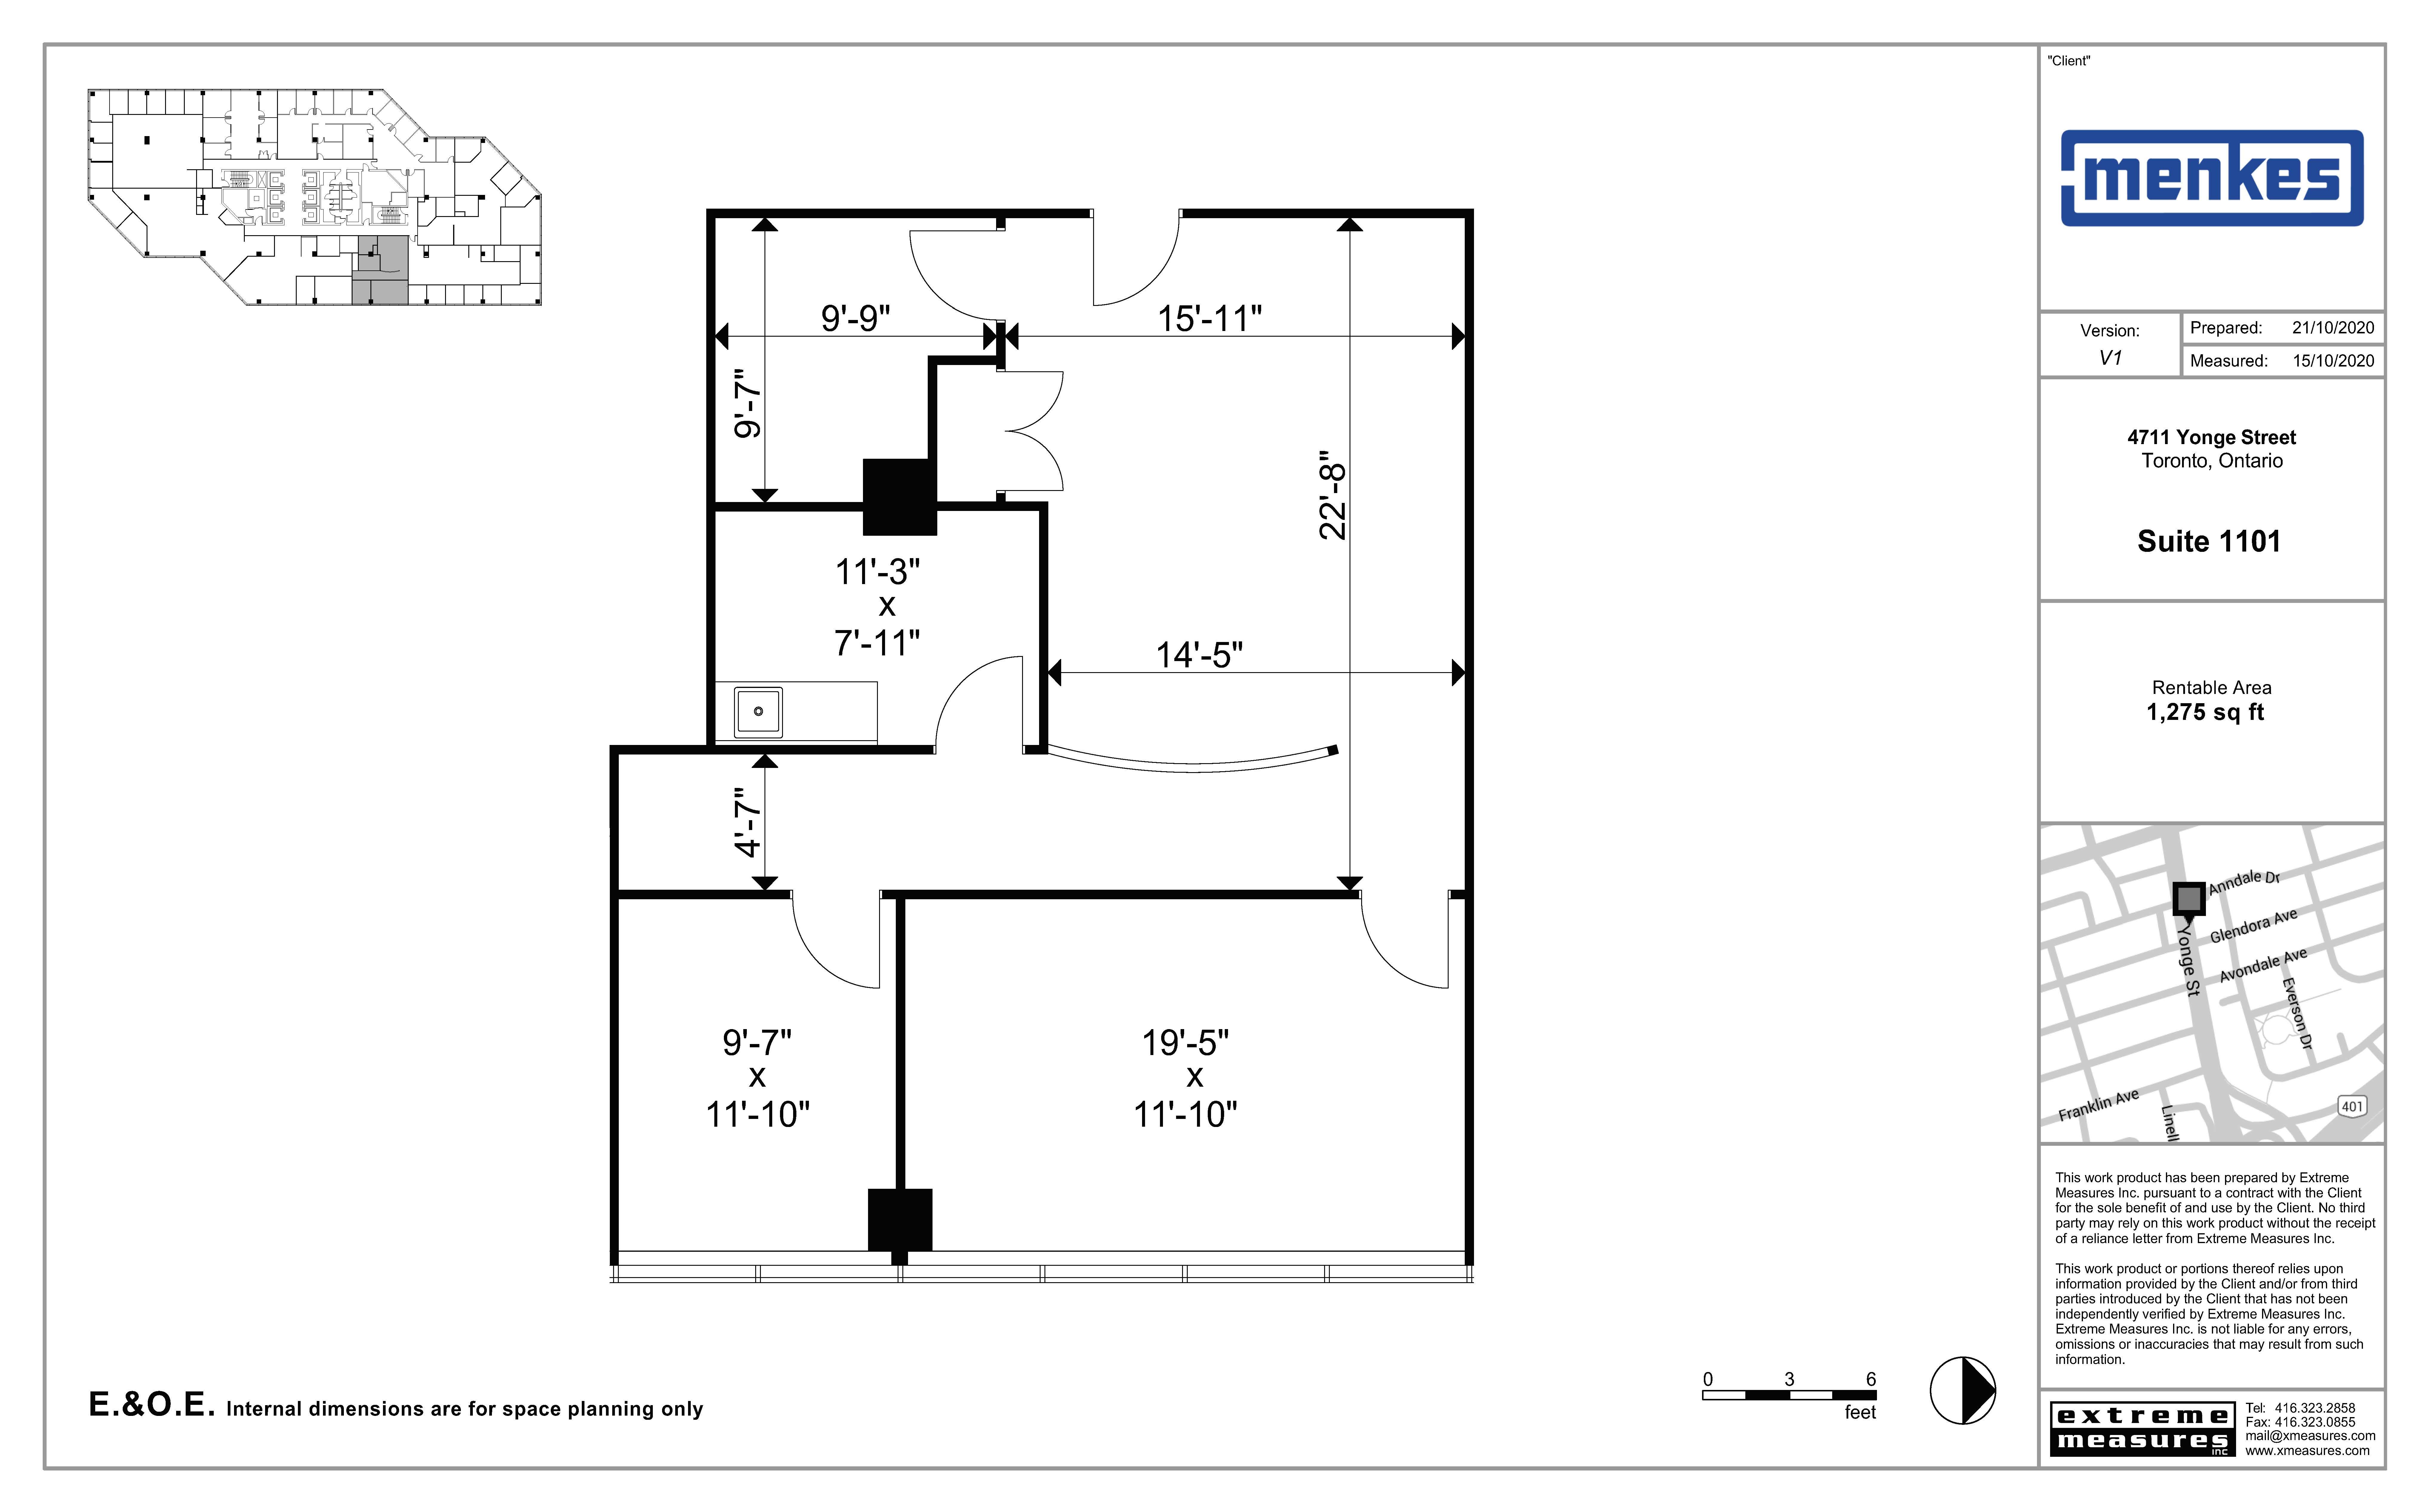 Floorplan thumbnail of Suite 1101